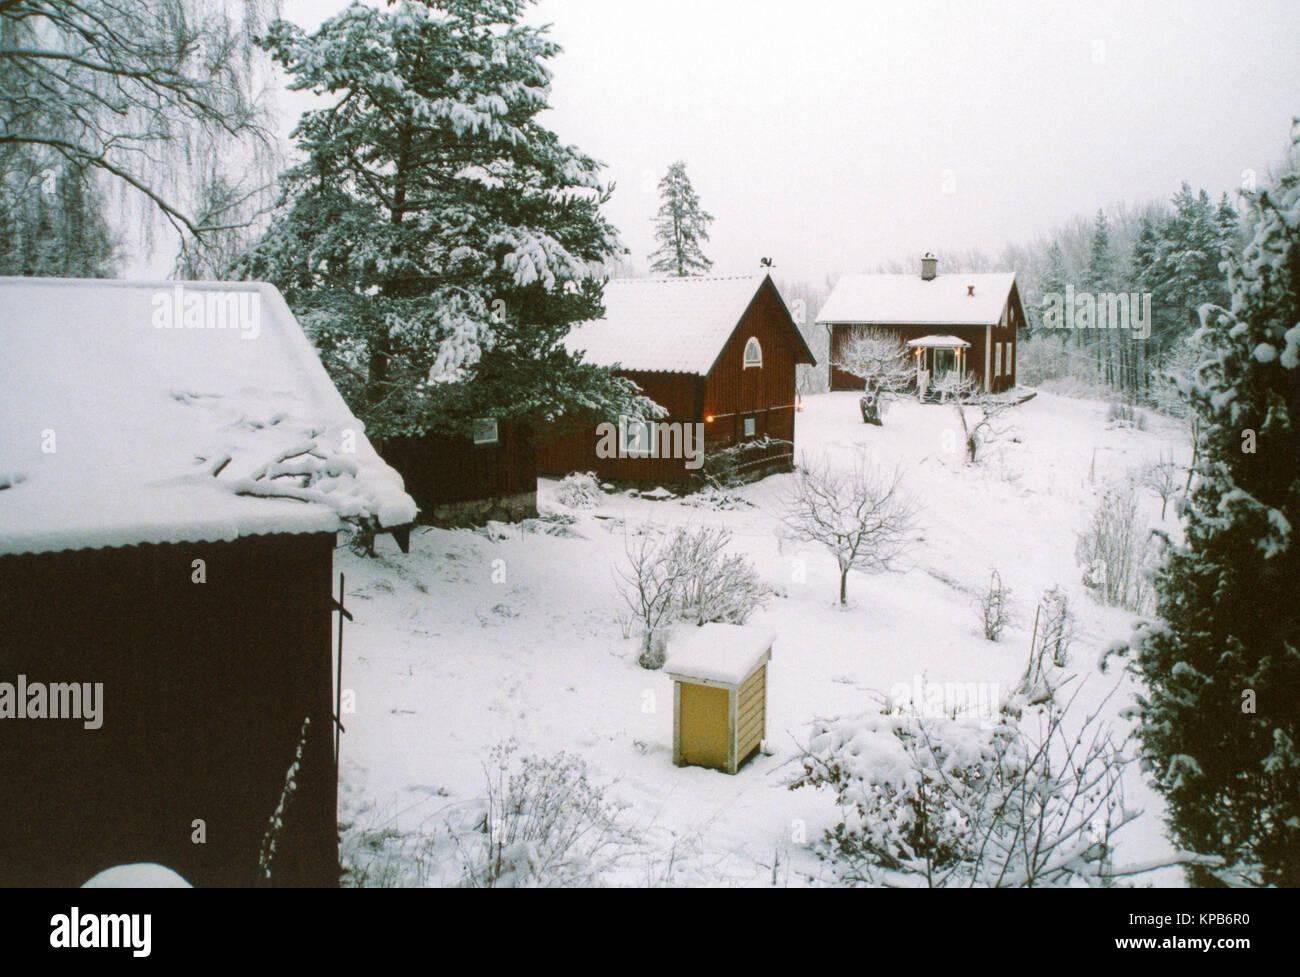 SMALL FARM HOUSE in winter season 2015 - Stock Image